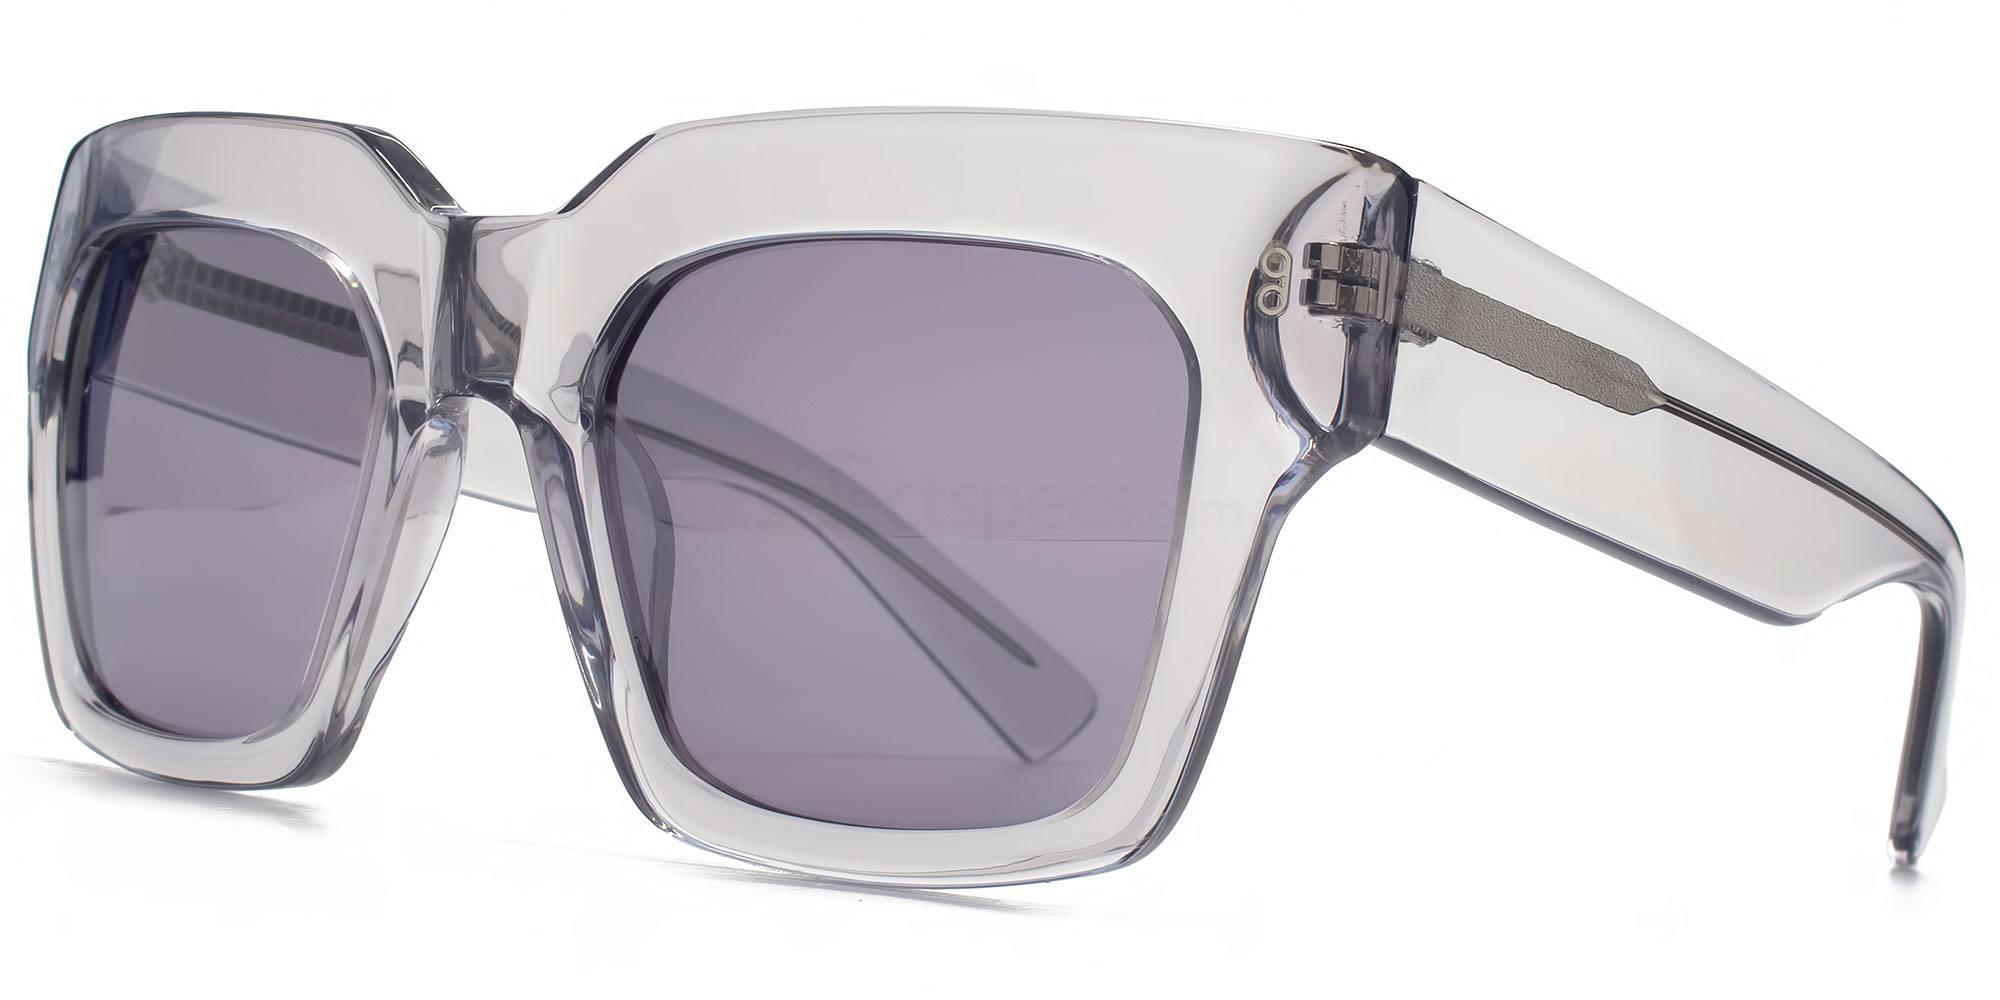 Hook LDN HK009 - GENESIS sunglasses